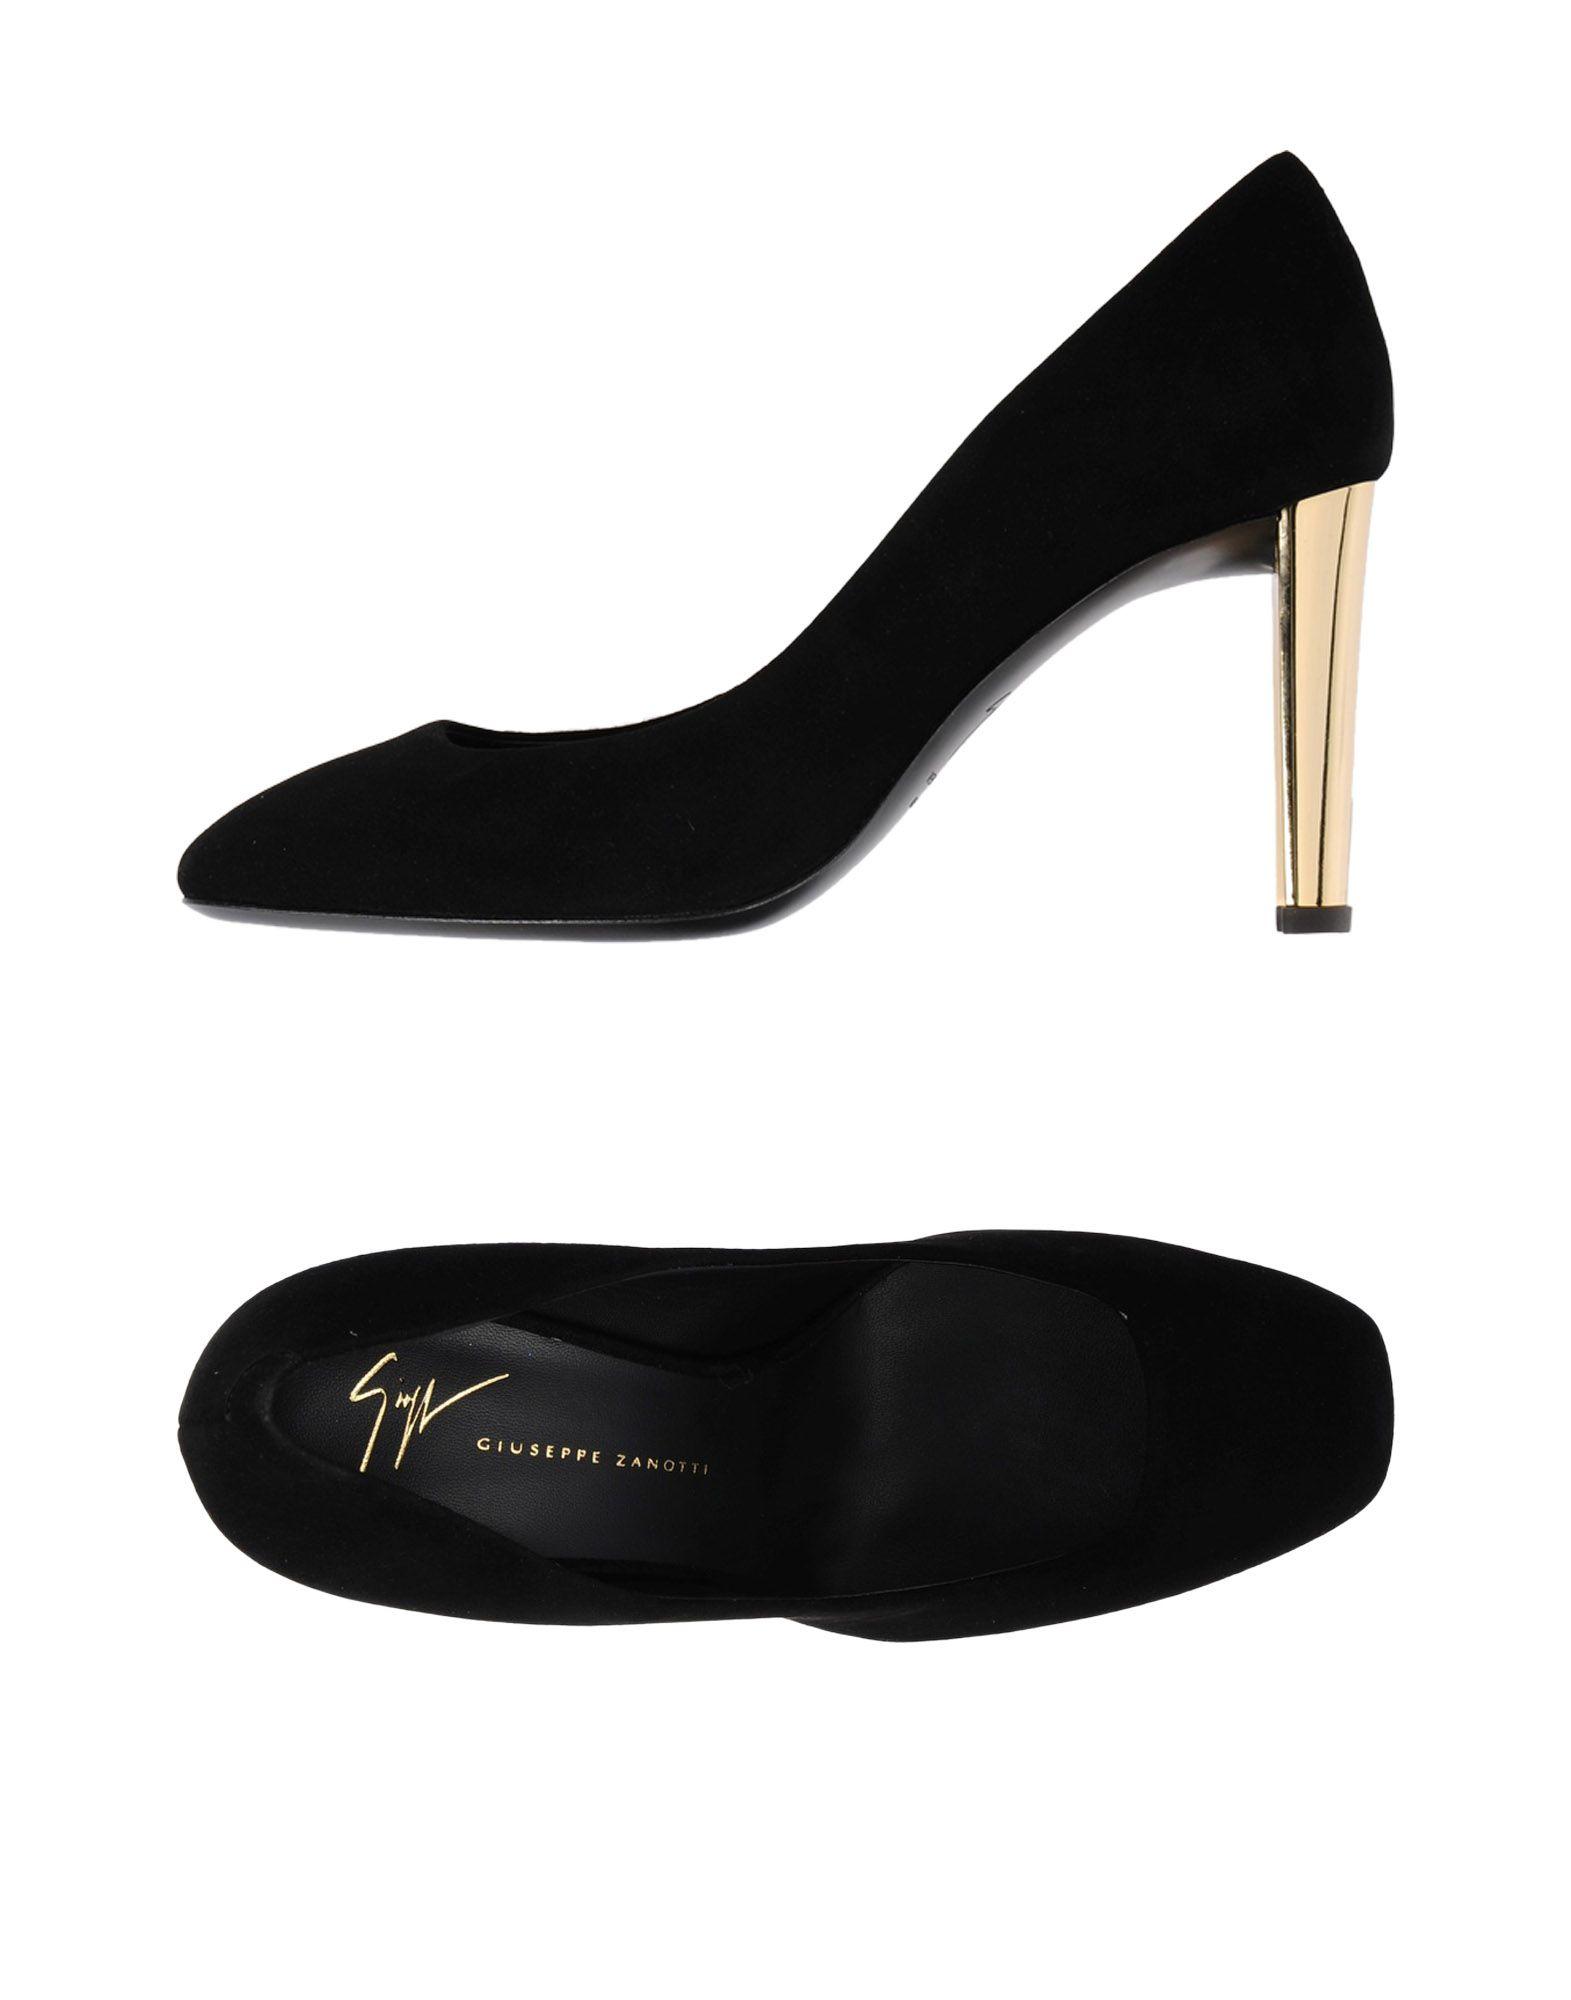 Escarpins Giuseppe Zanotti Femme - Escarpins Giuseppe Zanotti Noir Remise de marque